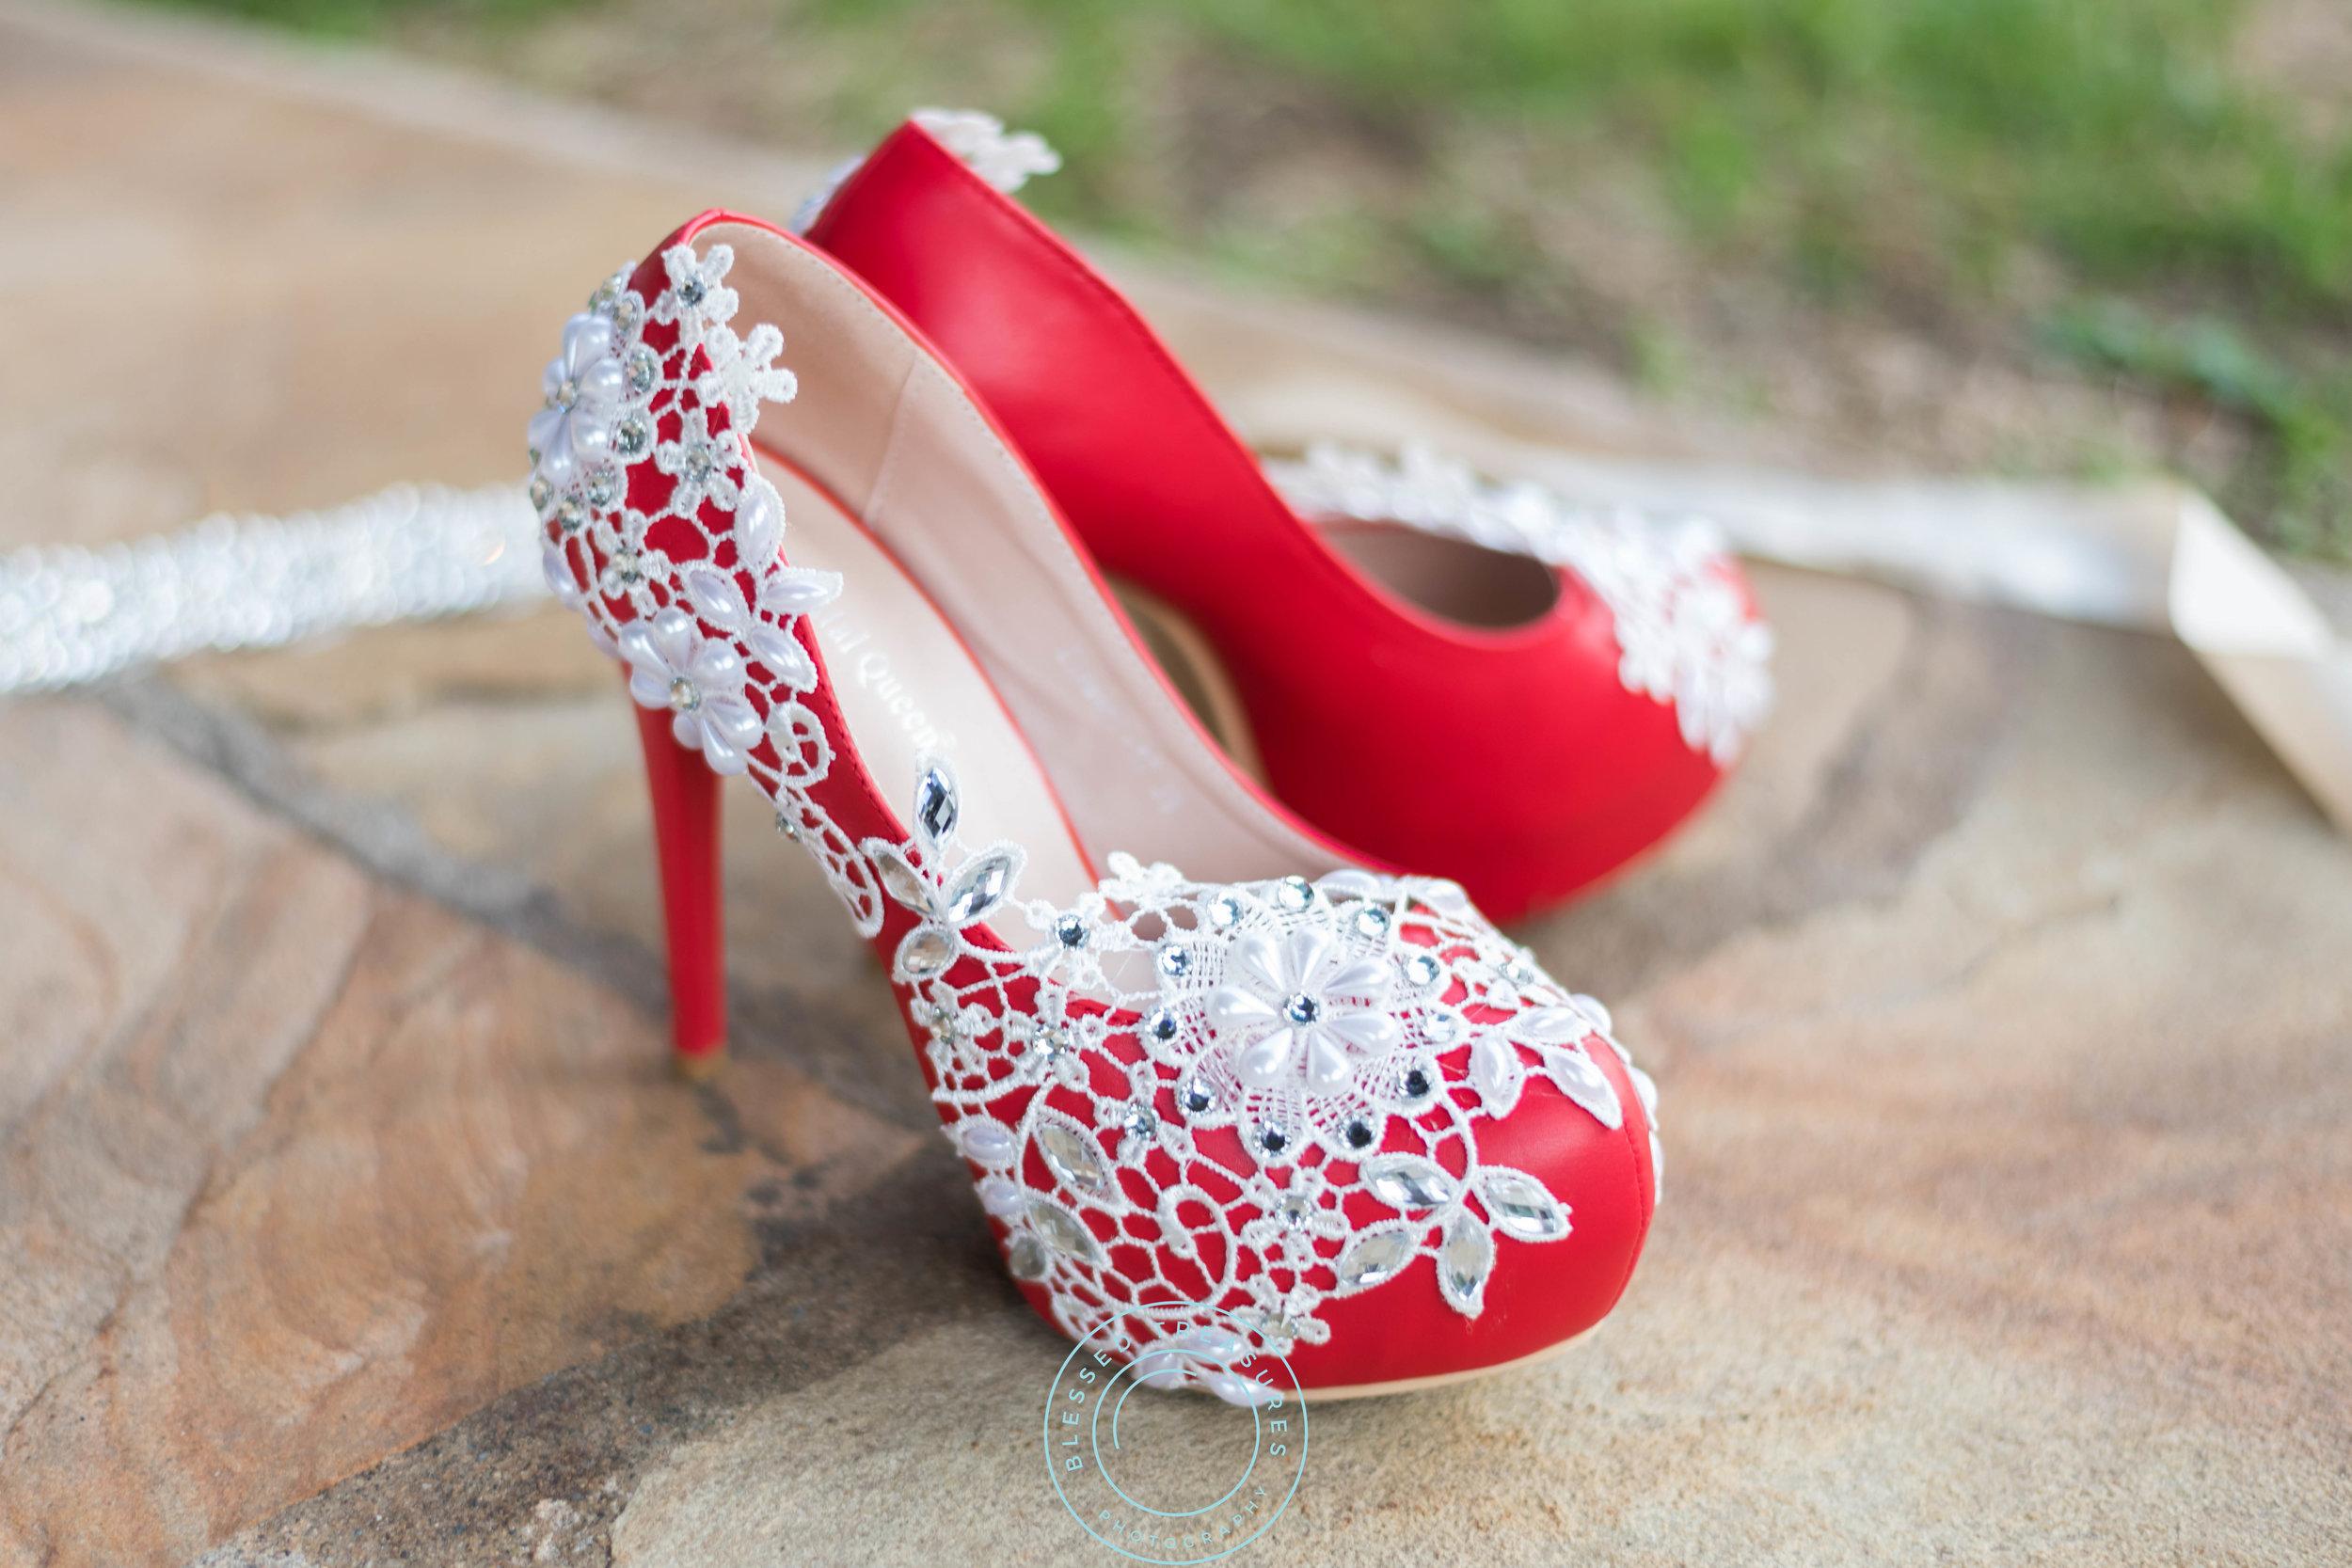 red heels pumps wedding shoes lace diamond sequin decoration